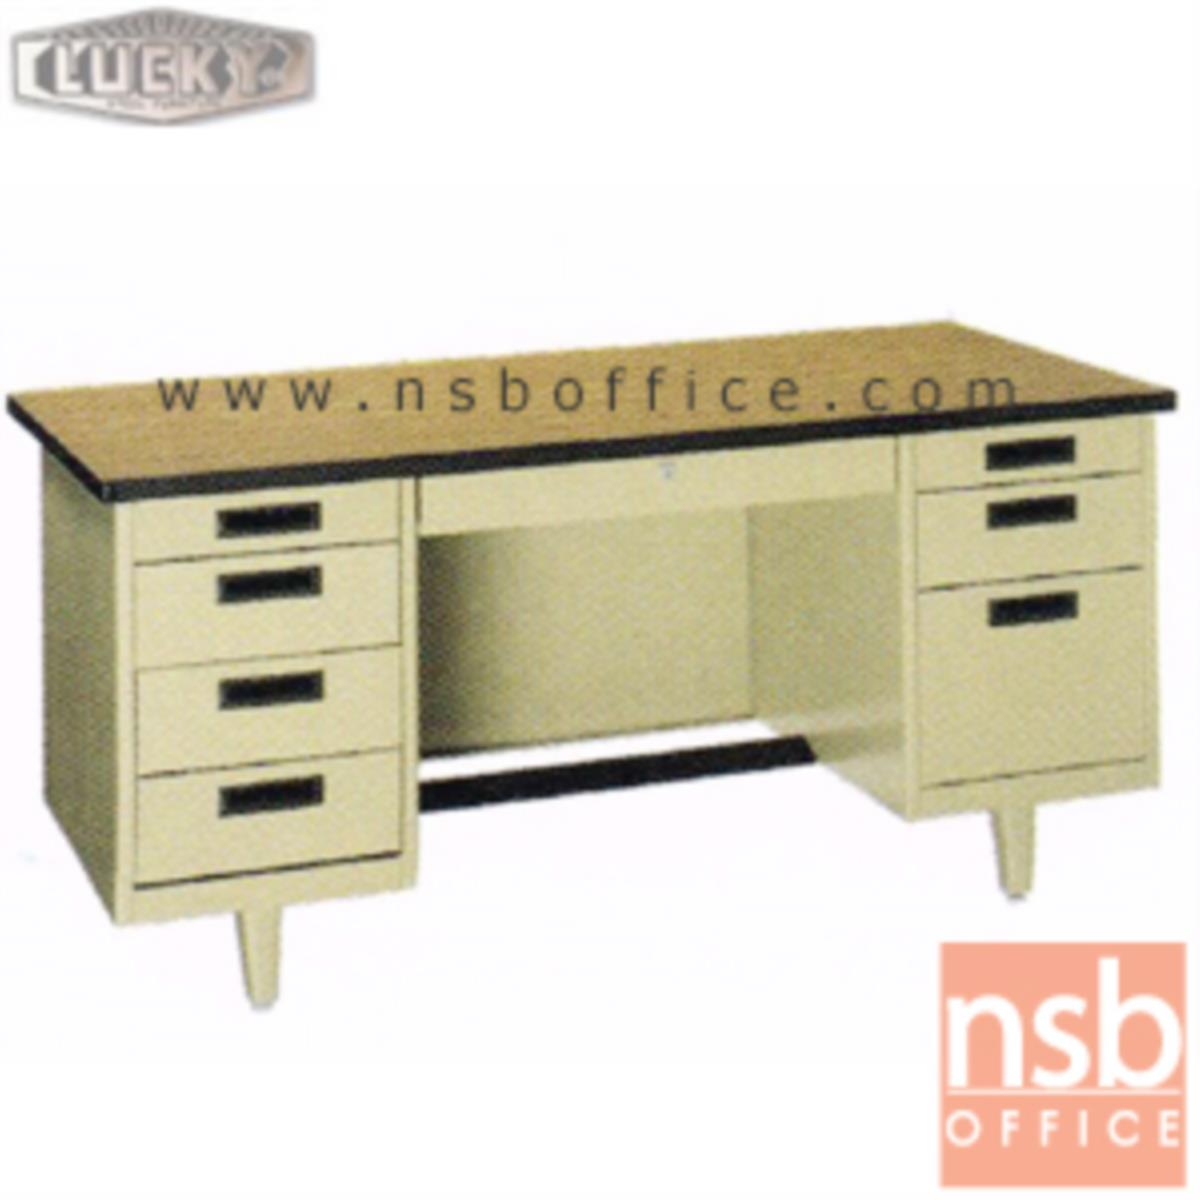 E28A101:โต๊ะทำงานเหล็กหน้าโฟเมก้าลายไม้ 8 ลิ้นชักรุ่นพิเศษ ยี่ห้อ Lucky  รุ่น NT-2654,NT-3060,NT-3472